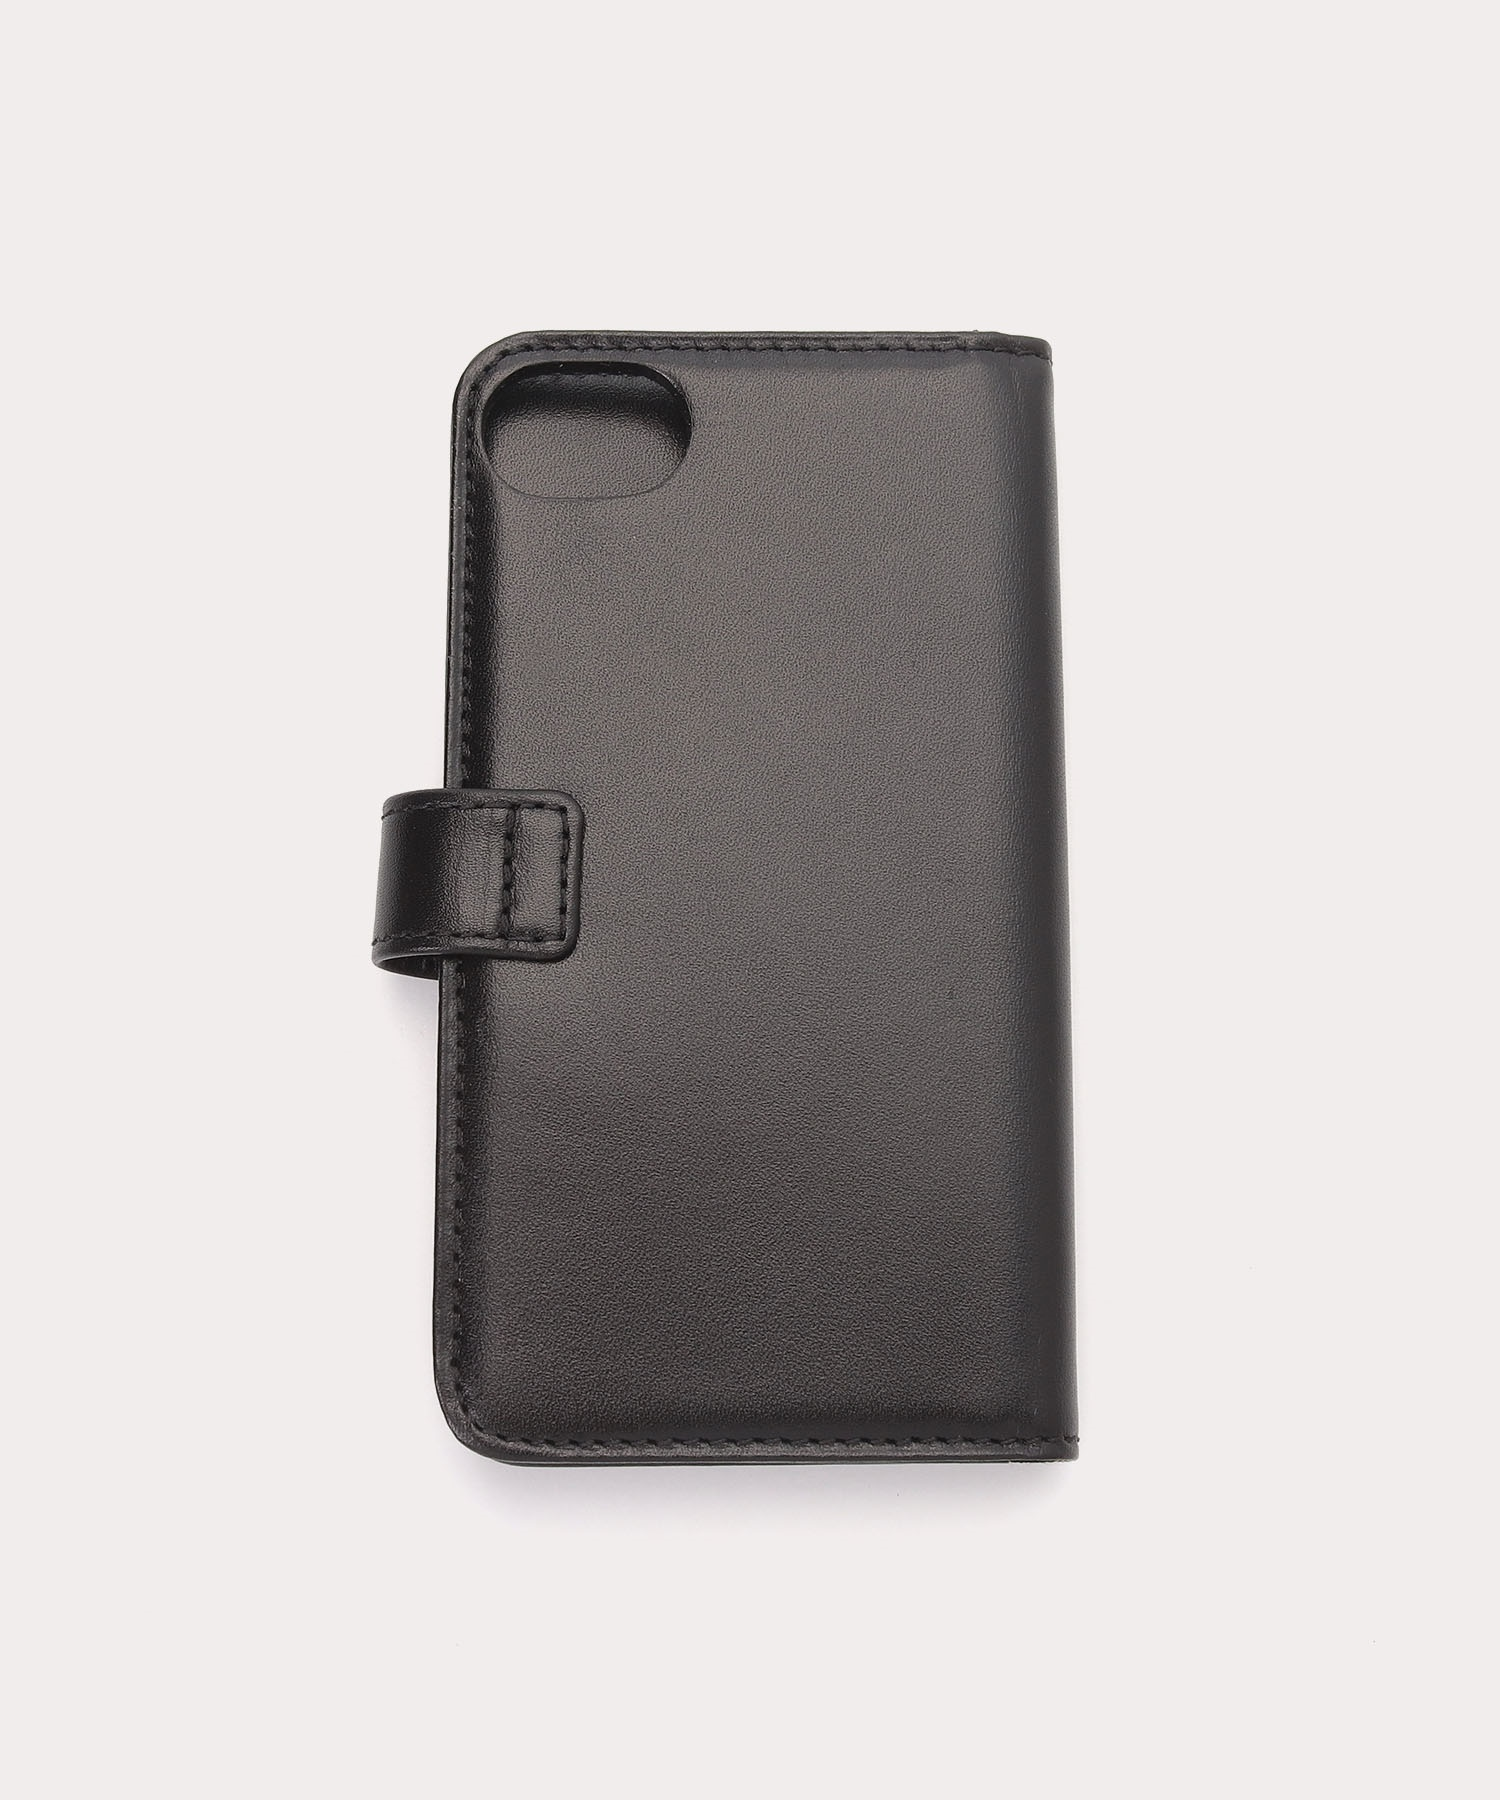 【iPhone 7/8用】ヴィンテージ WATER ORB スマホケース